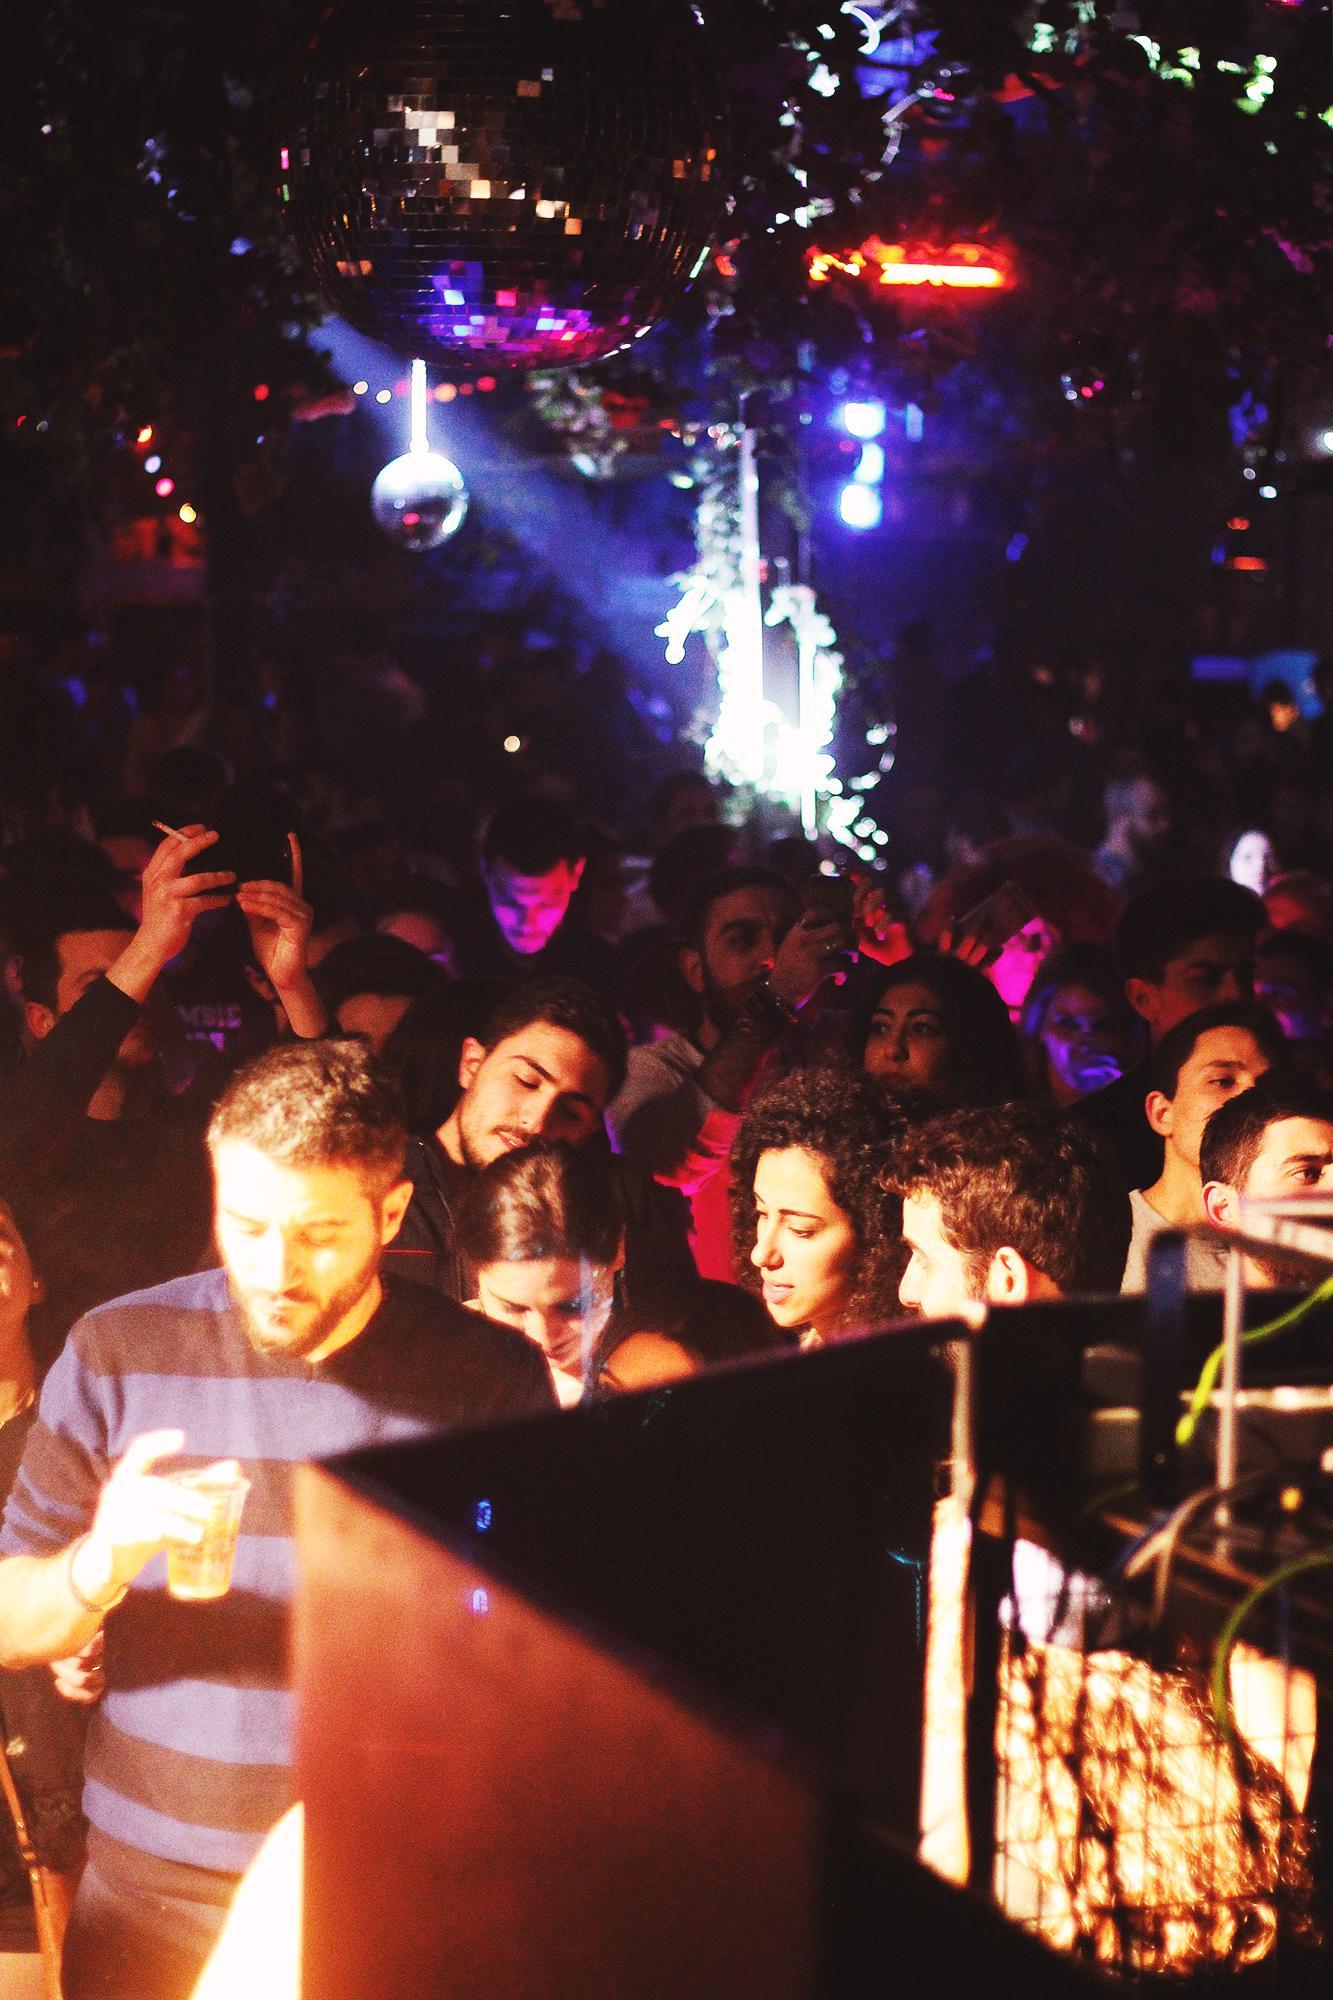 Beirut Grand Factory Crowd bunt